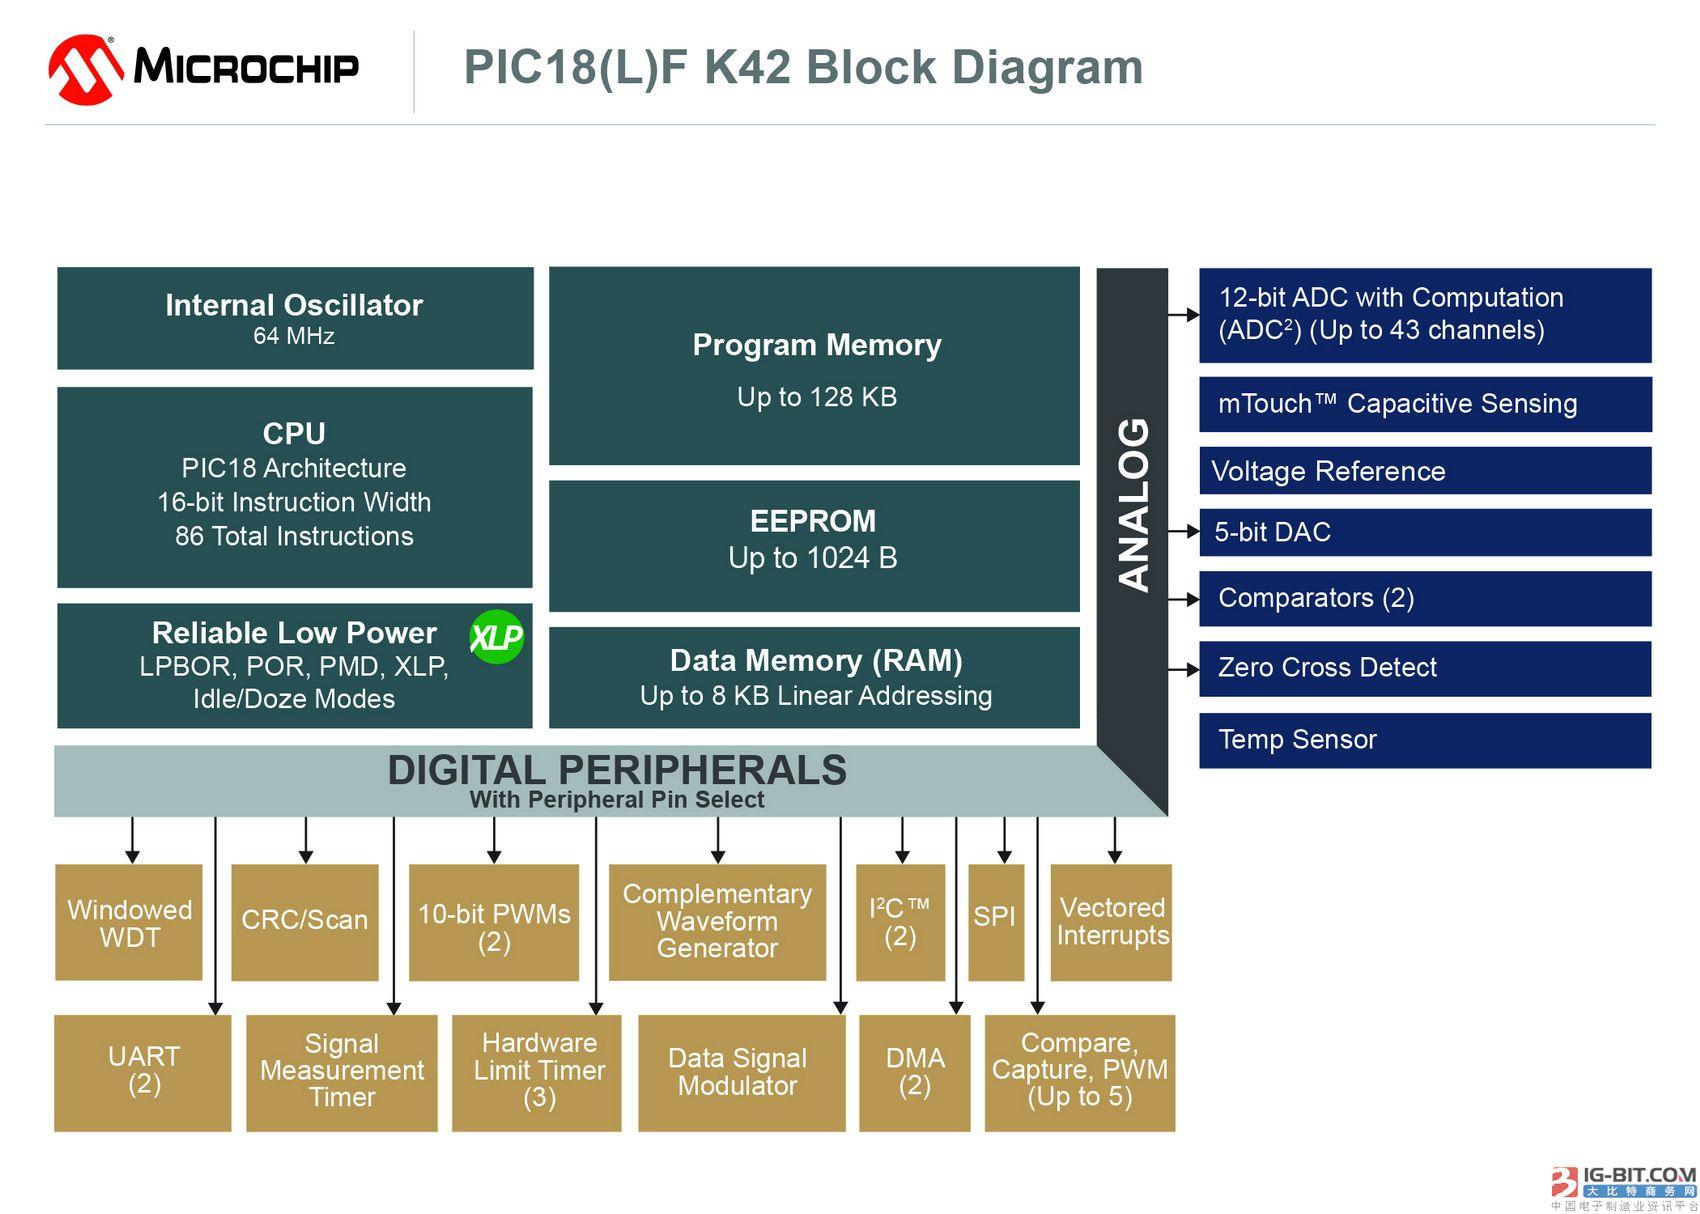 Microchip PIC18系列新器件问世 借助多种独立于内核的外设进一步简化复杂设计